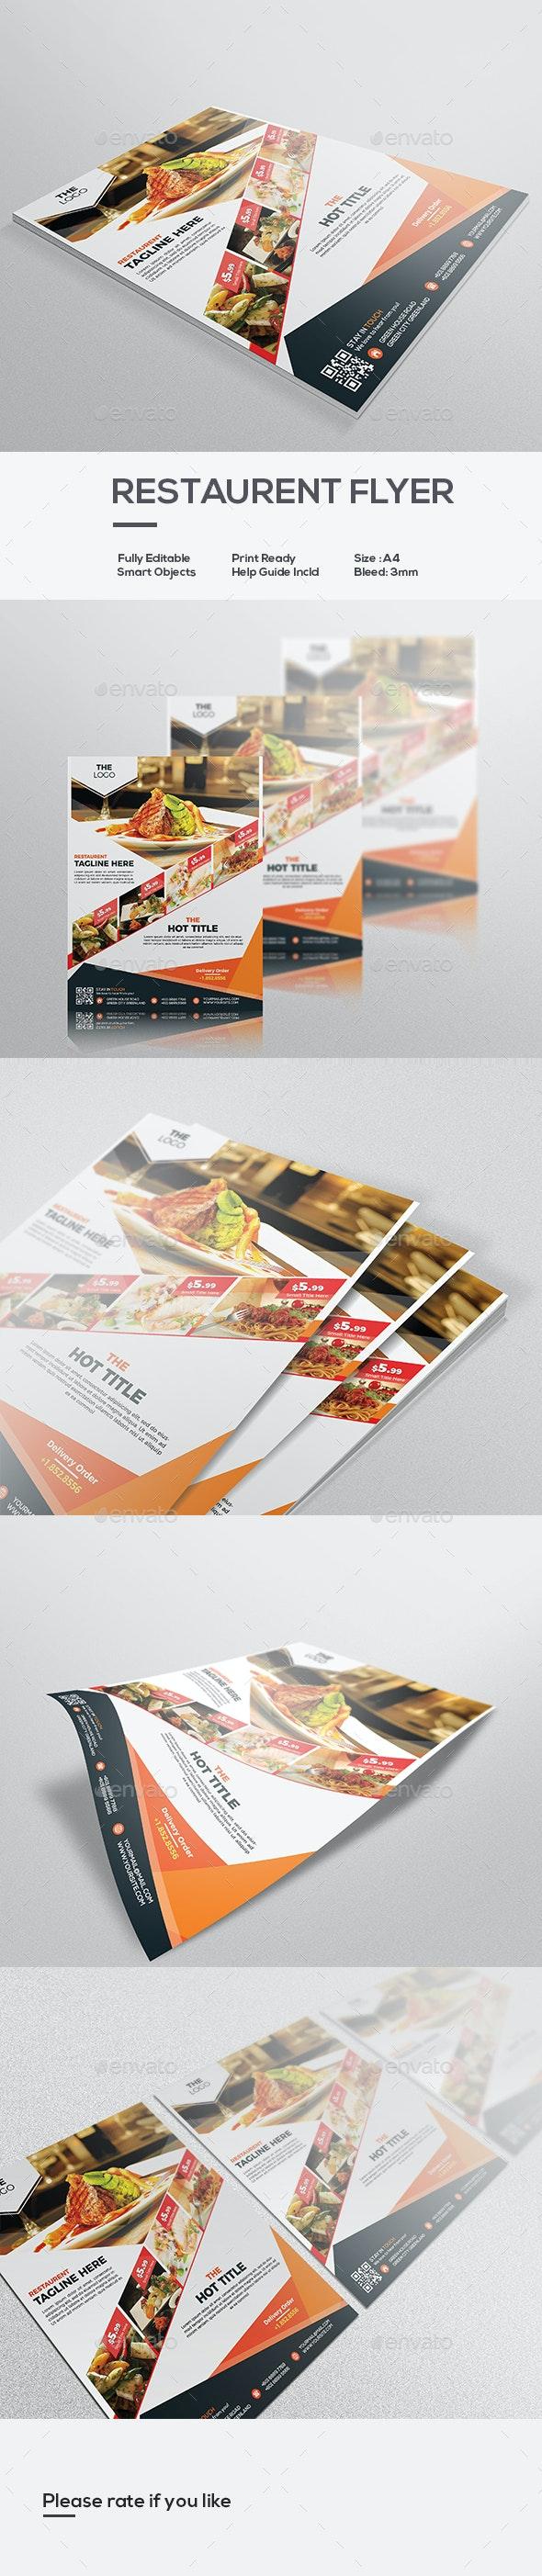 Restaurant Flyer - Restaurant Flyers